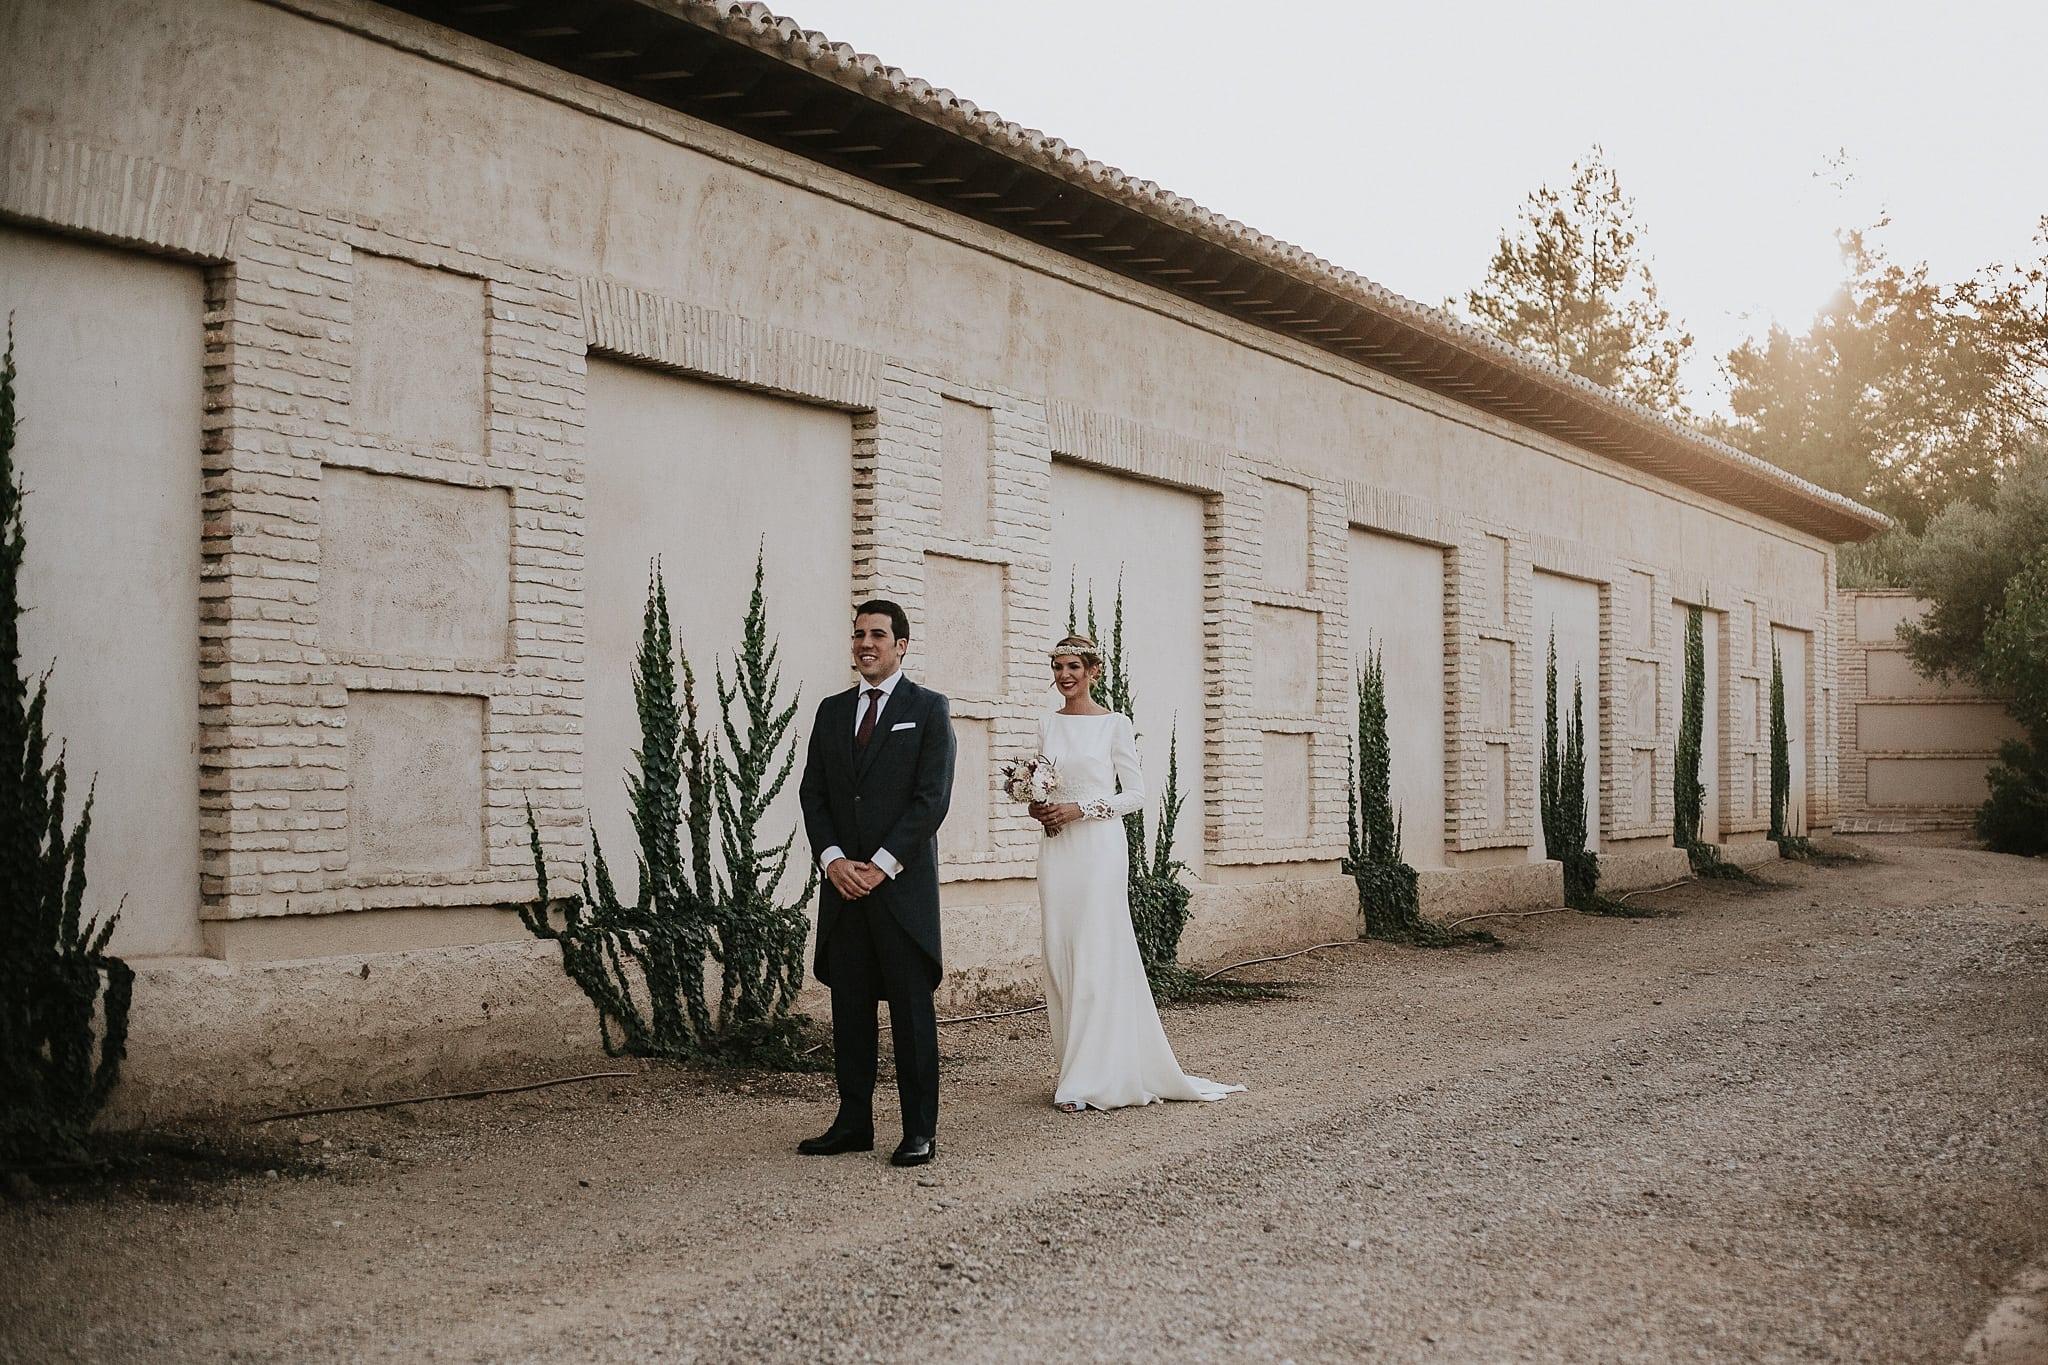 prisma-blanco-fotografos-bodas-toledo-62